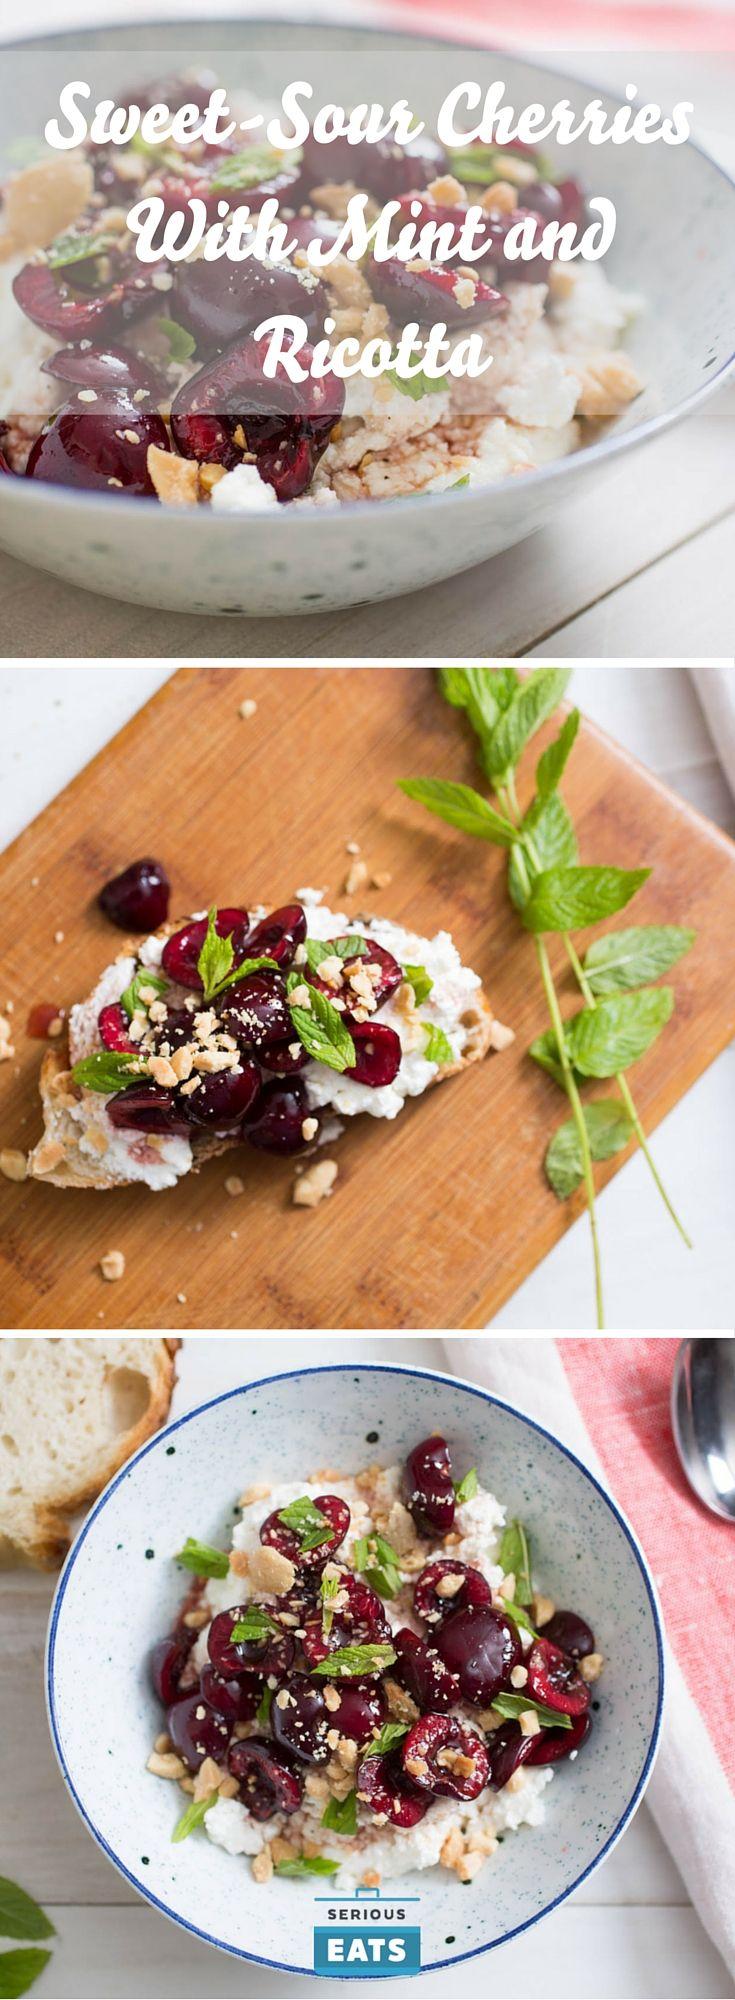 1000+ images about Just Desserts on Pinterest | Lemon cakes, Coconut ...